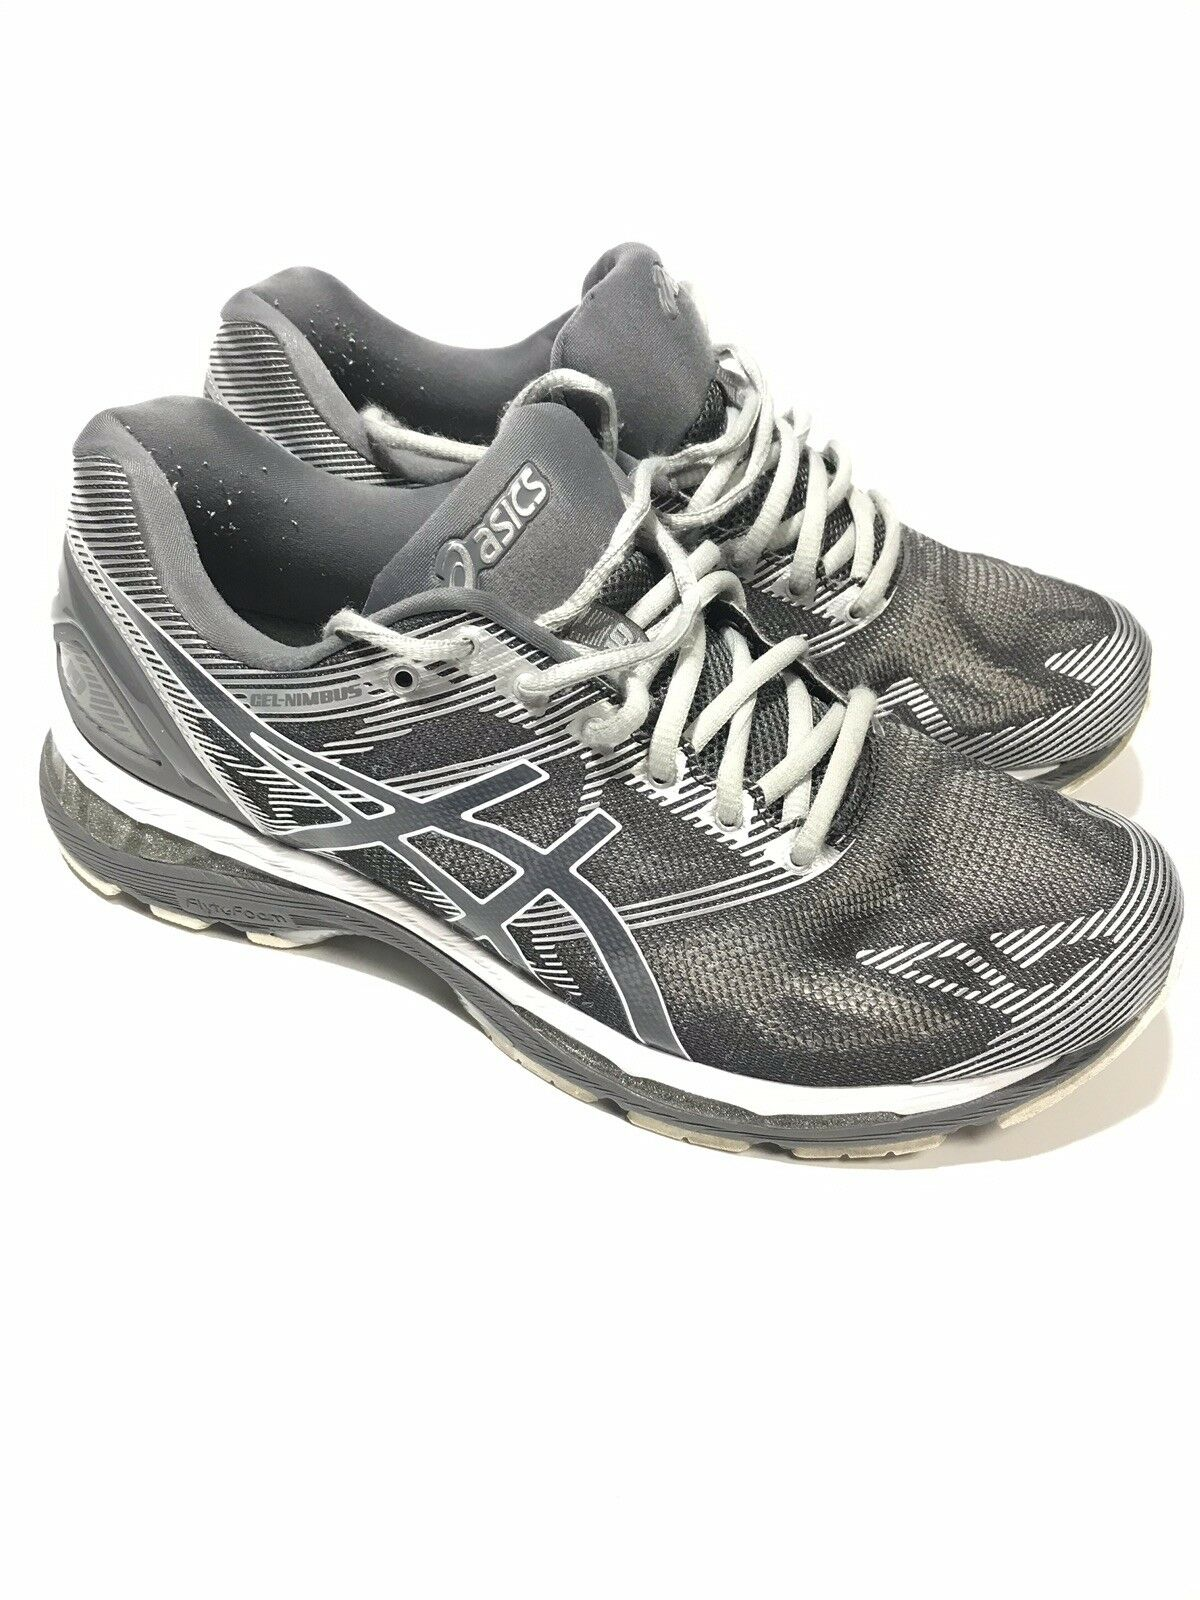 Asics Para Hombre Gel Nimbus 19 T700N Plata Carbono Calzado para Correr